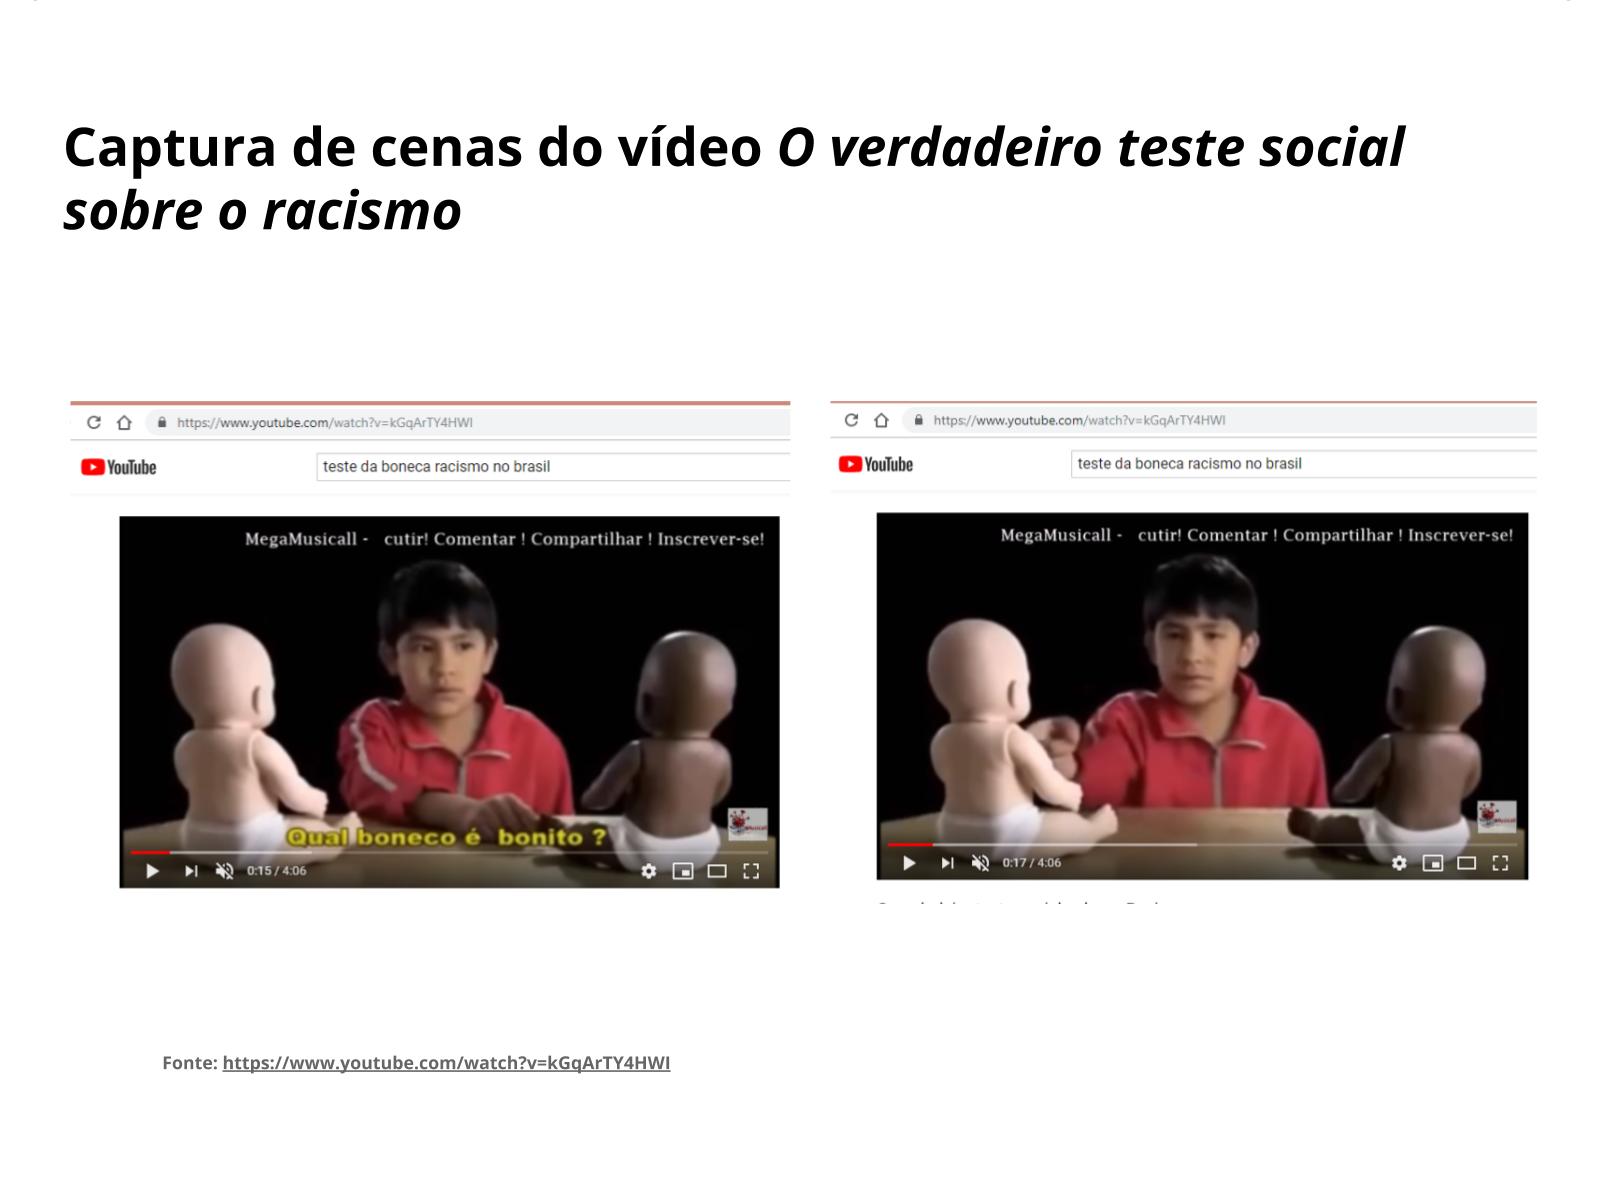 Darwinismo social no Brasil